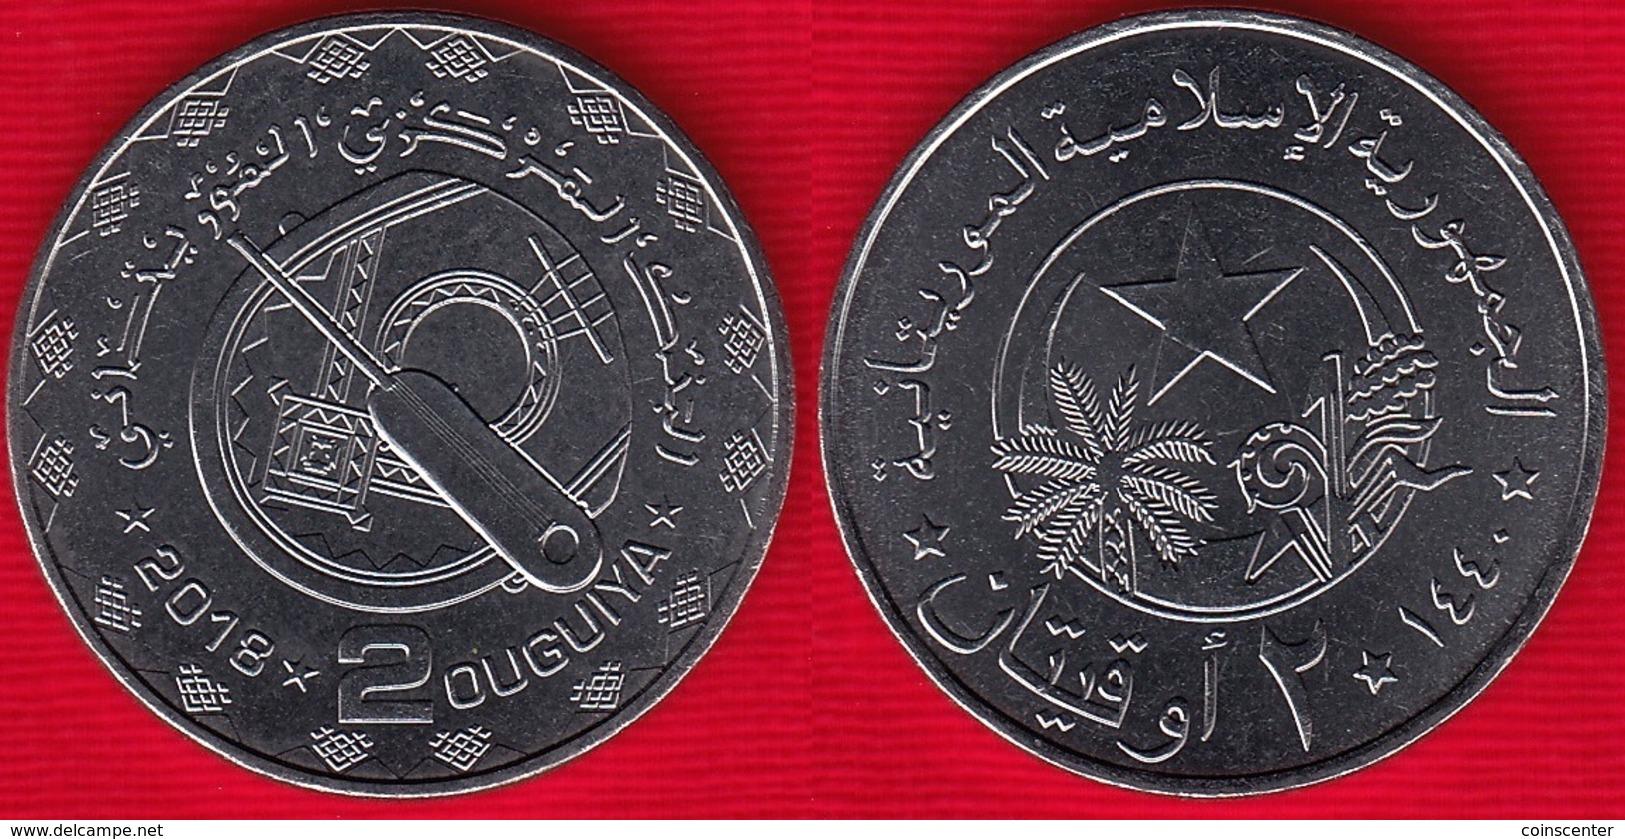 Mauritania 2 Ouguiya 2018 UNC - Mauritania